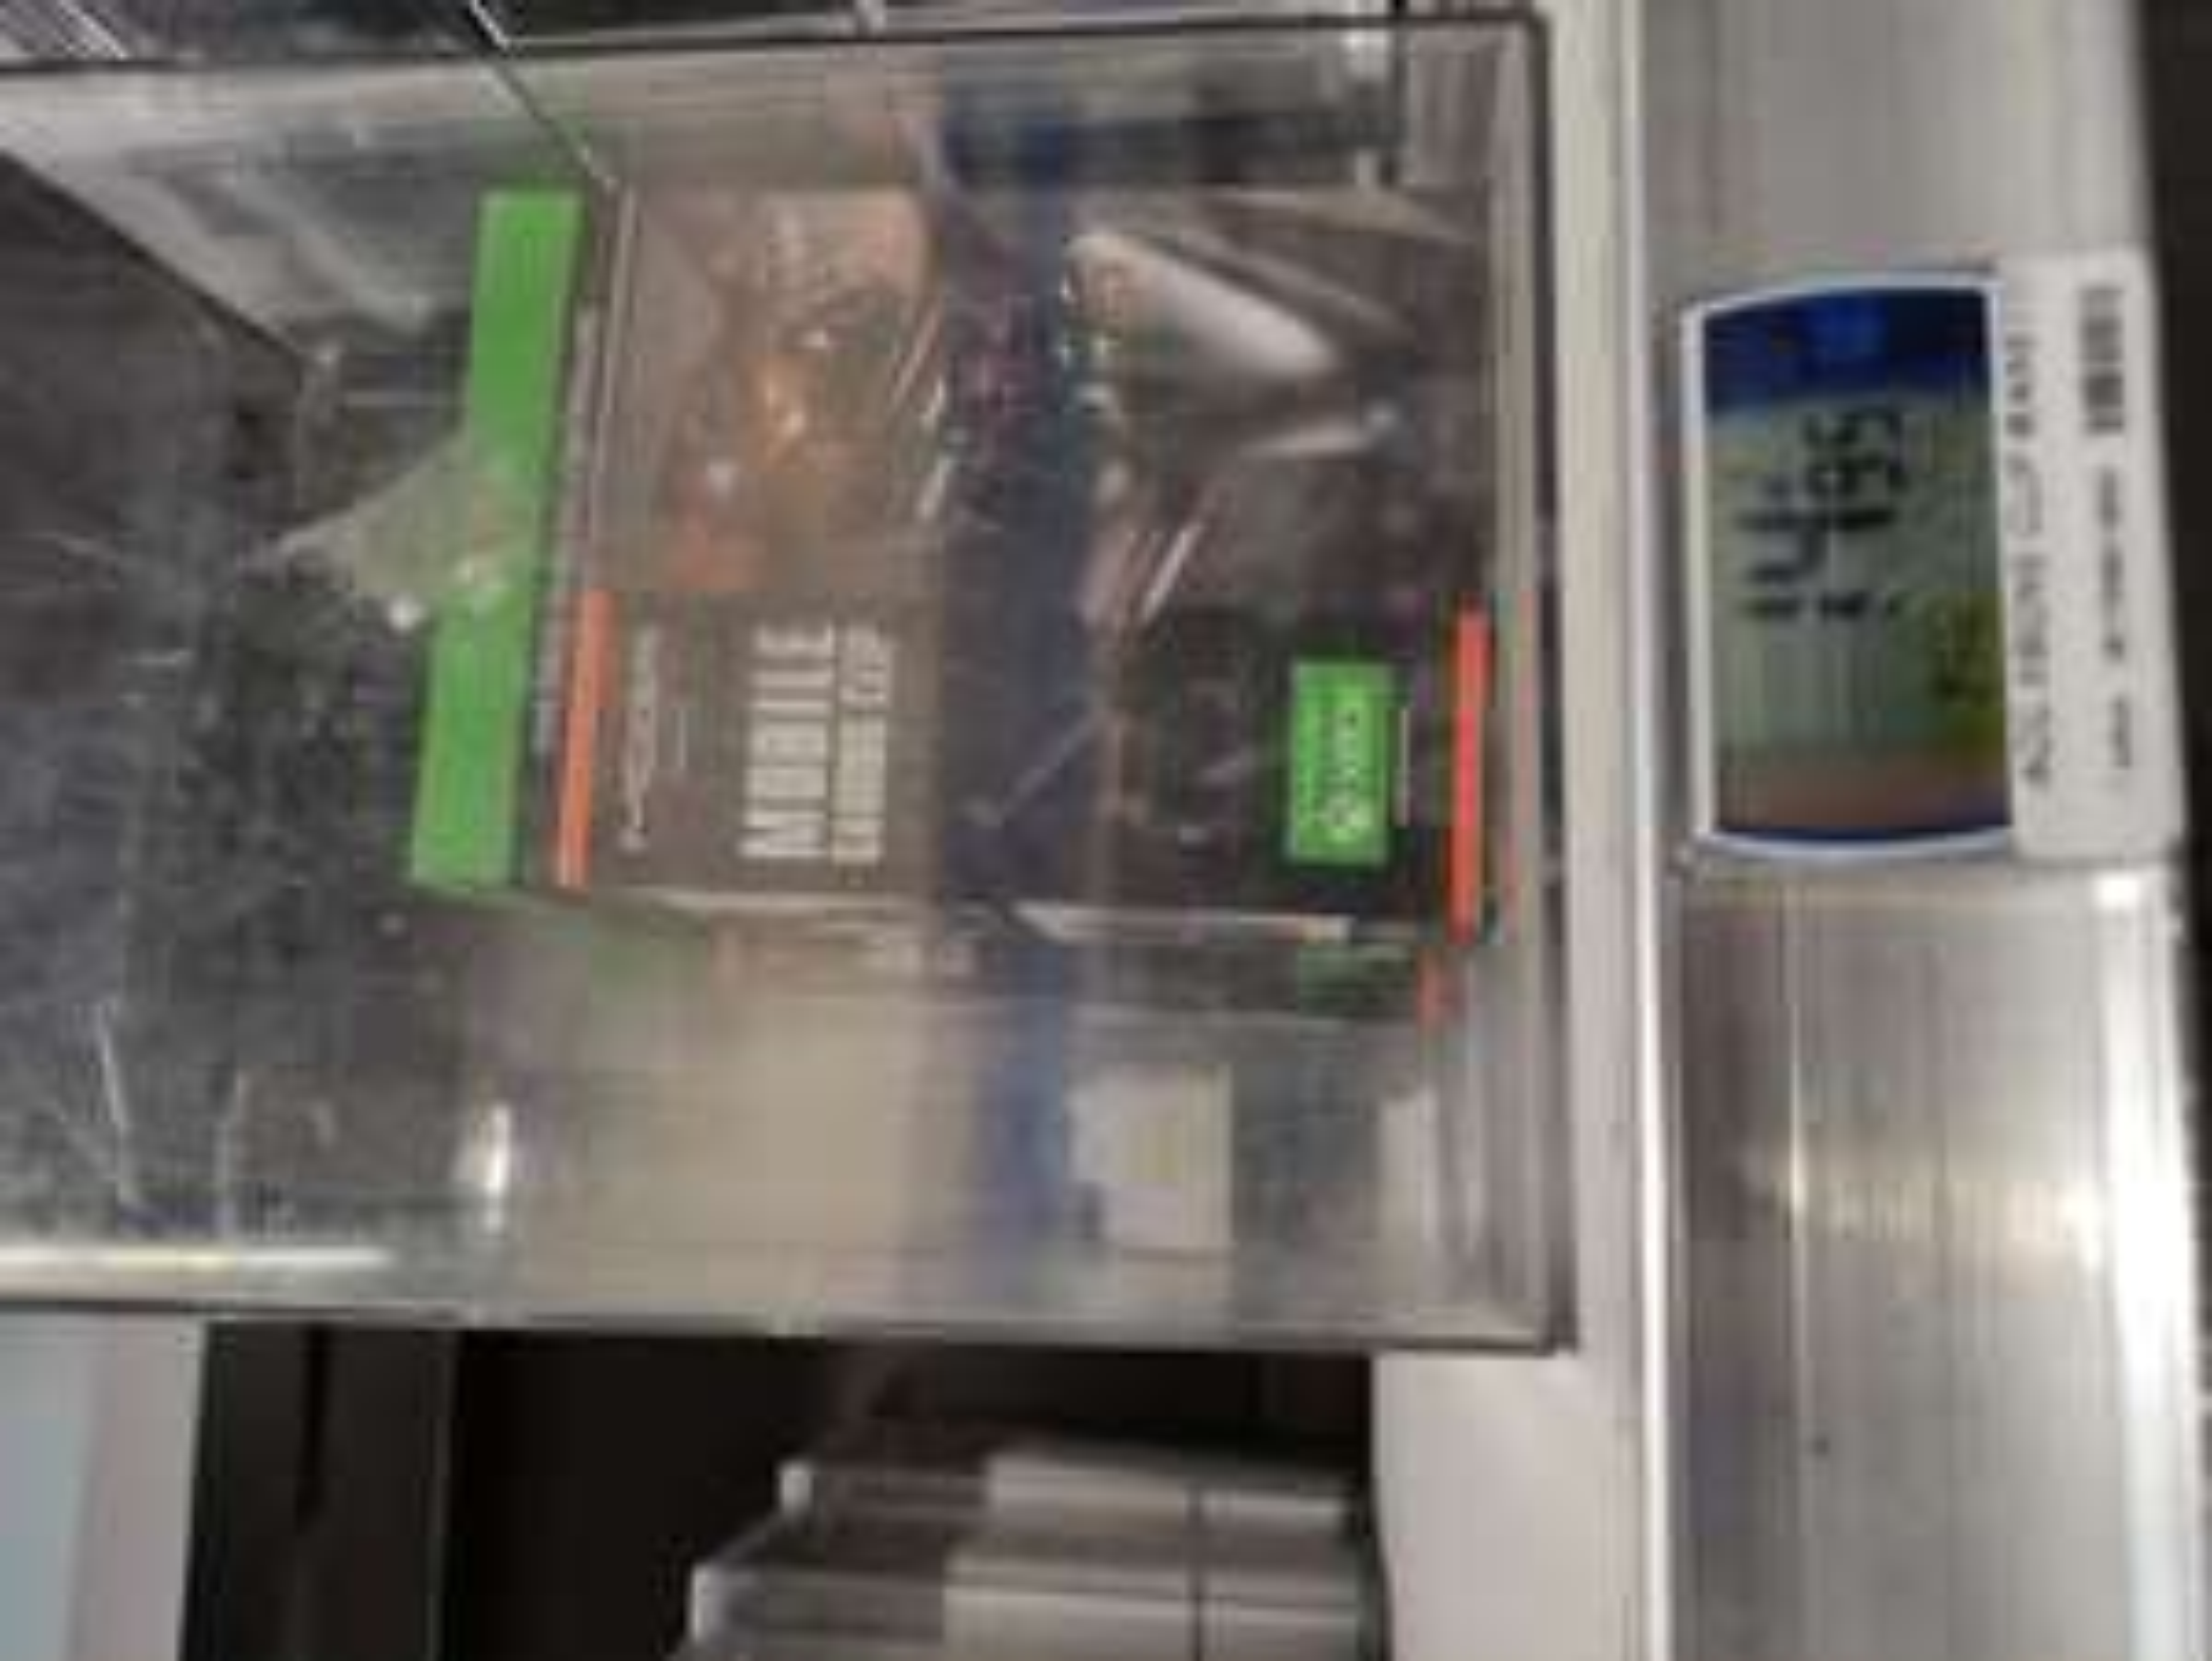 Clip pour smartphone sur manette Xbox One PowerA Moga Mobile Gaming Clip - Rosny-sous-Bois (93)